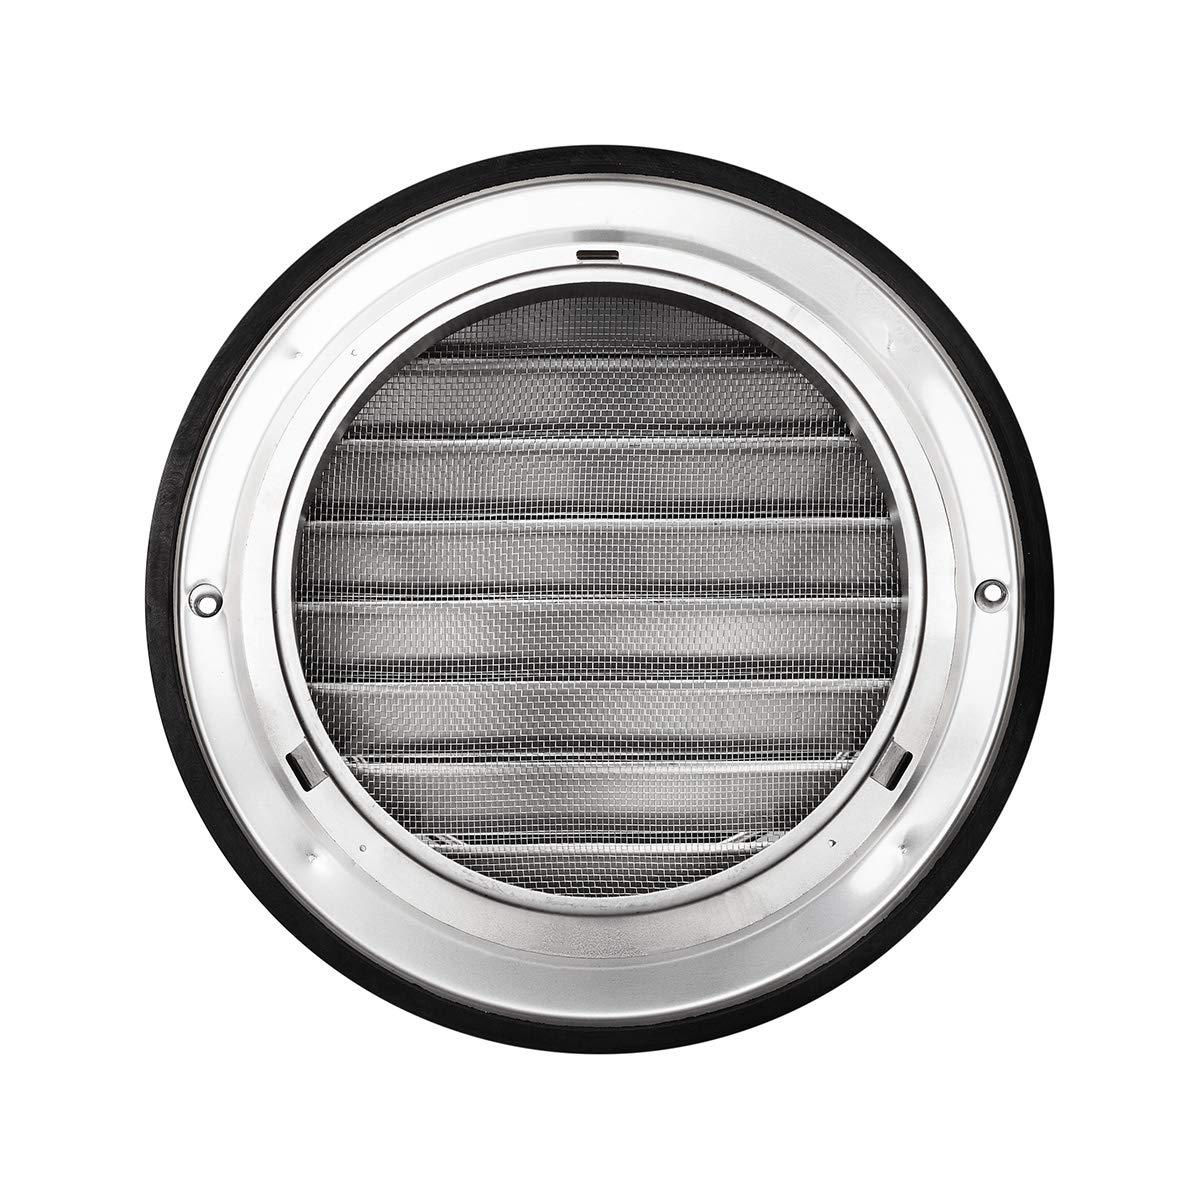 Klimapartner KWG 150 6 Inch Stainless Steel Round Ventilation Outdoor Grill Screen Hood